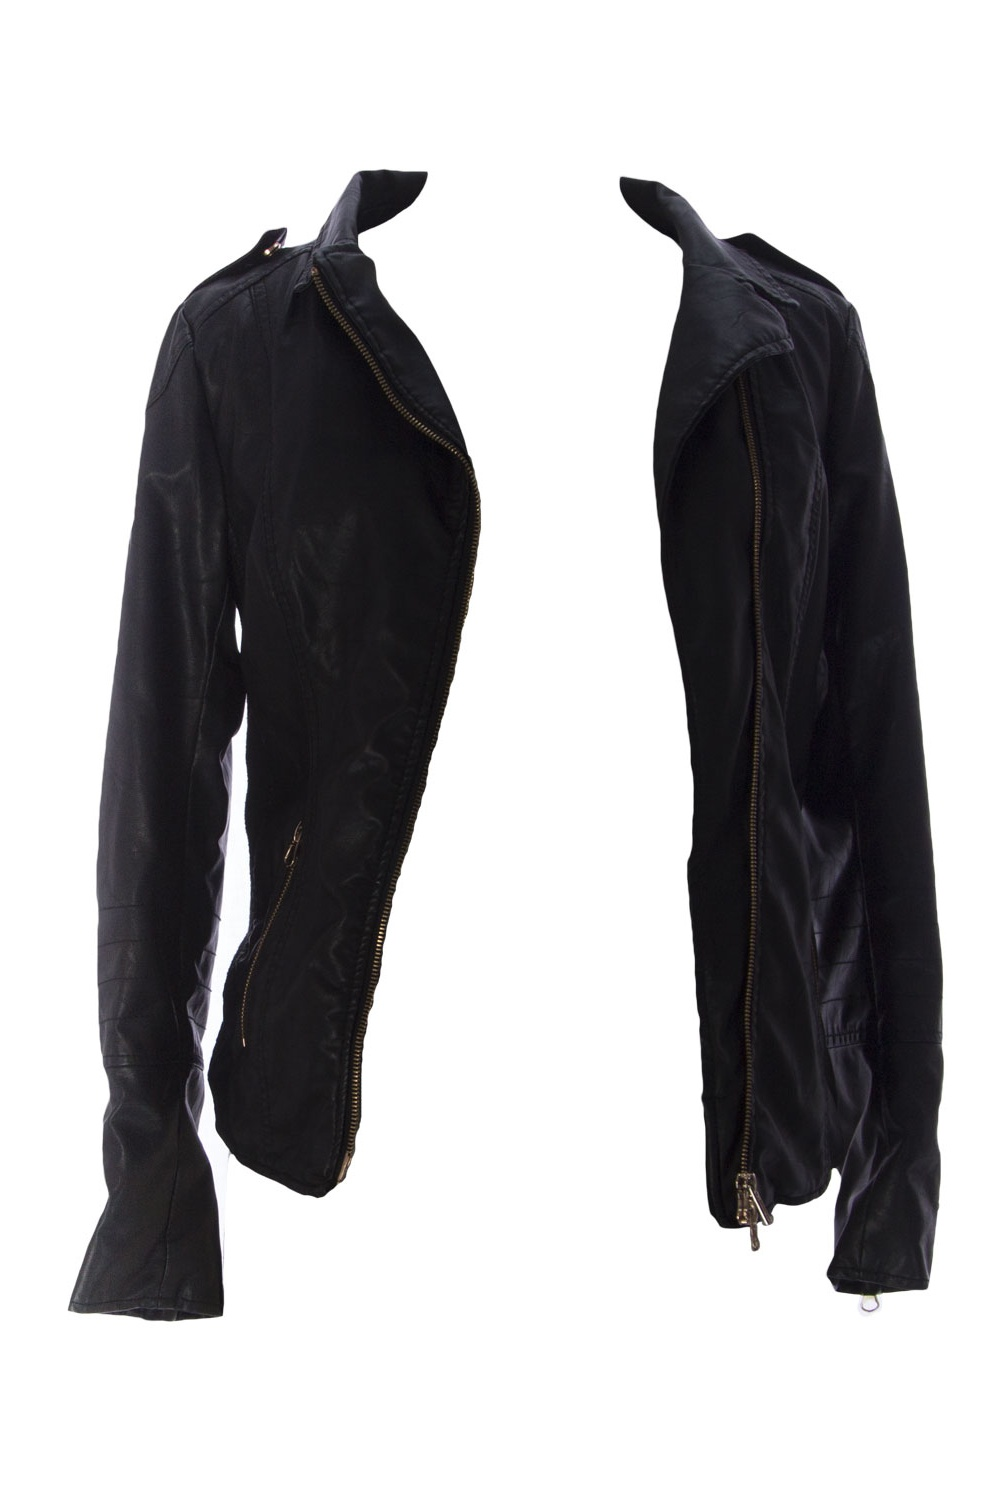 MOM2MOM Maternity Women's Faux Leather Jacket, EU 36, Black